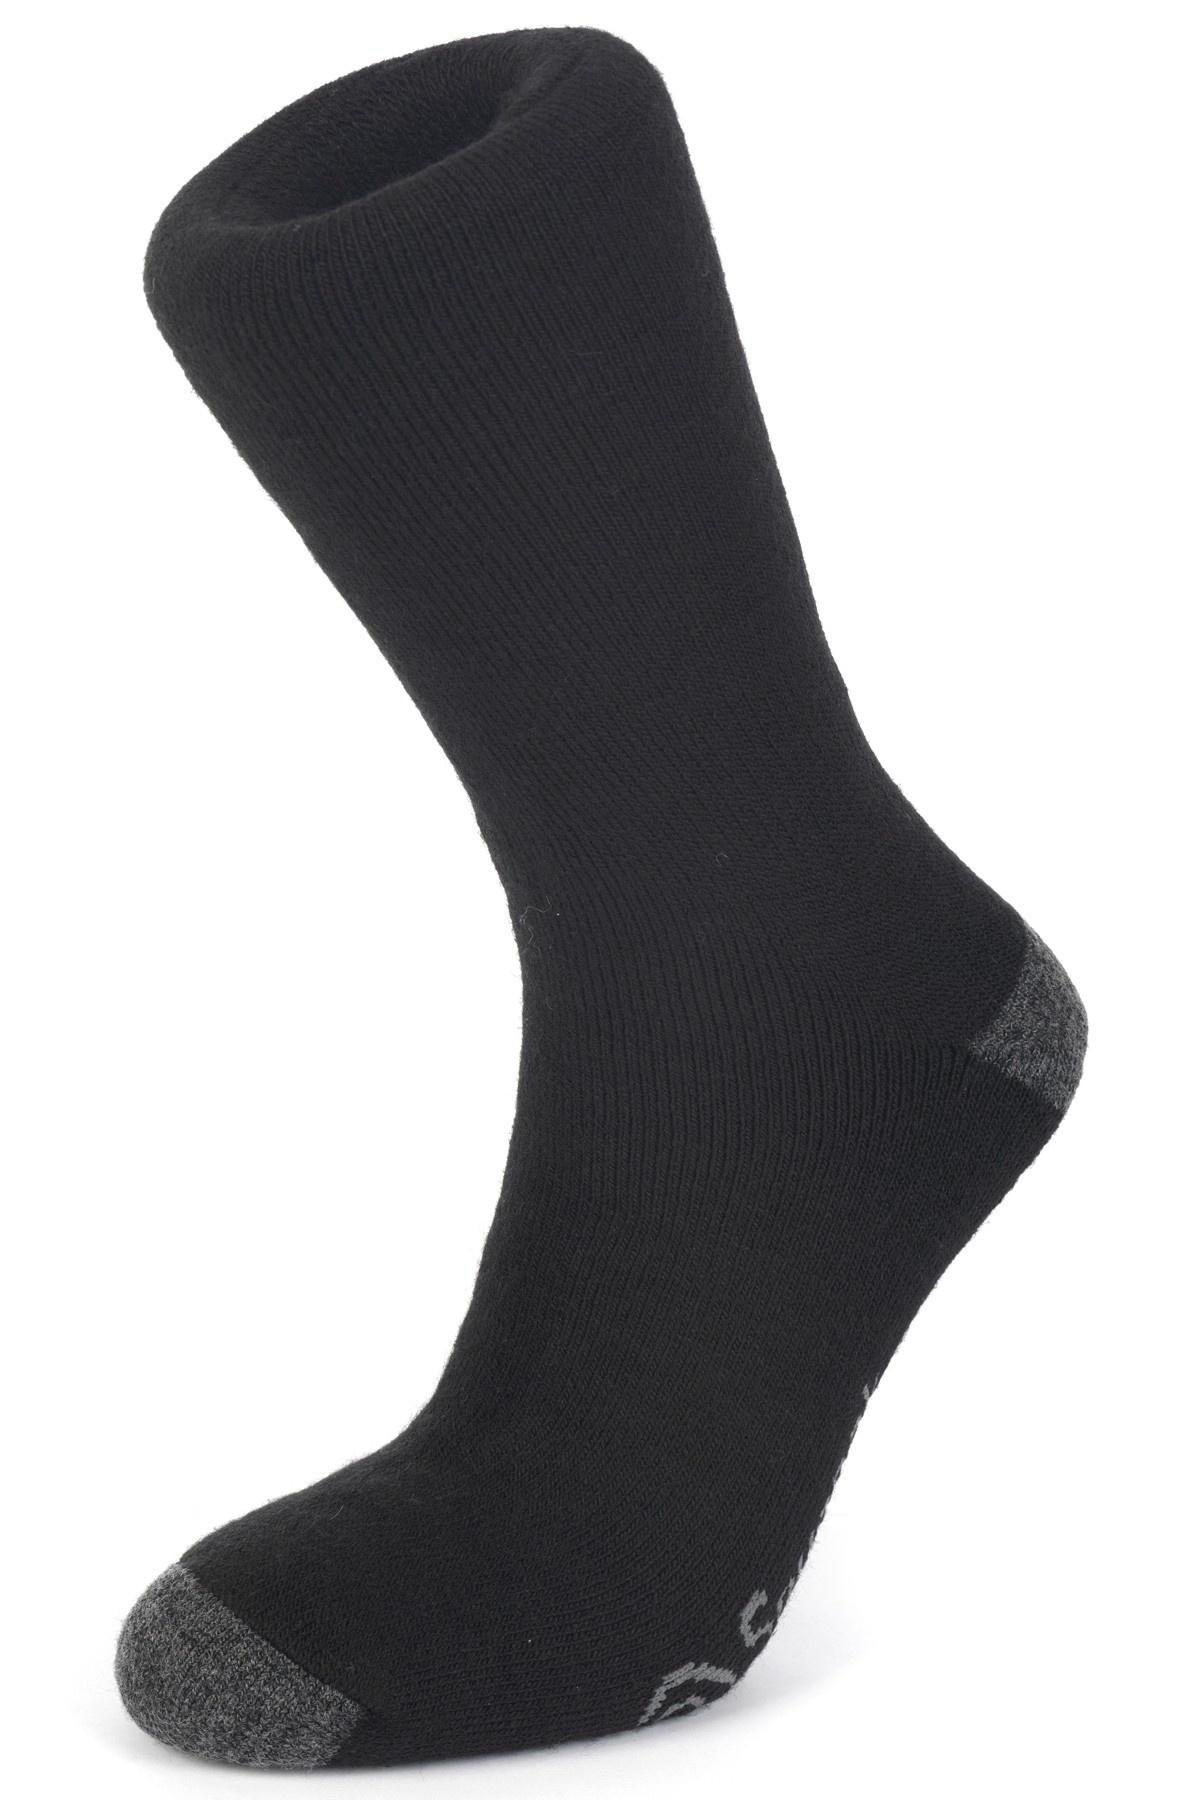 Snugpak Merino Wool Unisex Underwear Socks Black All Sizes